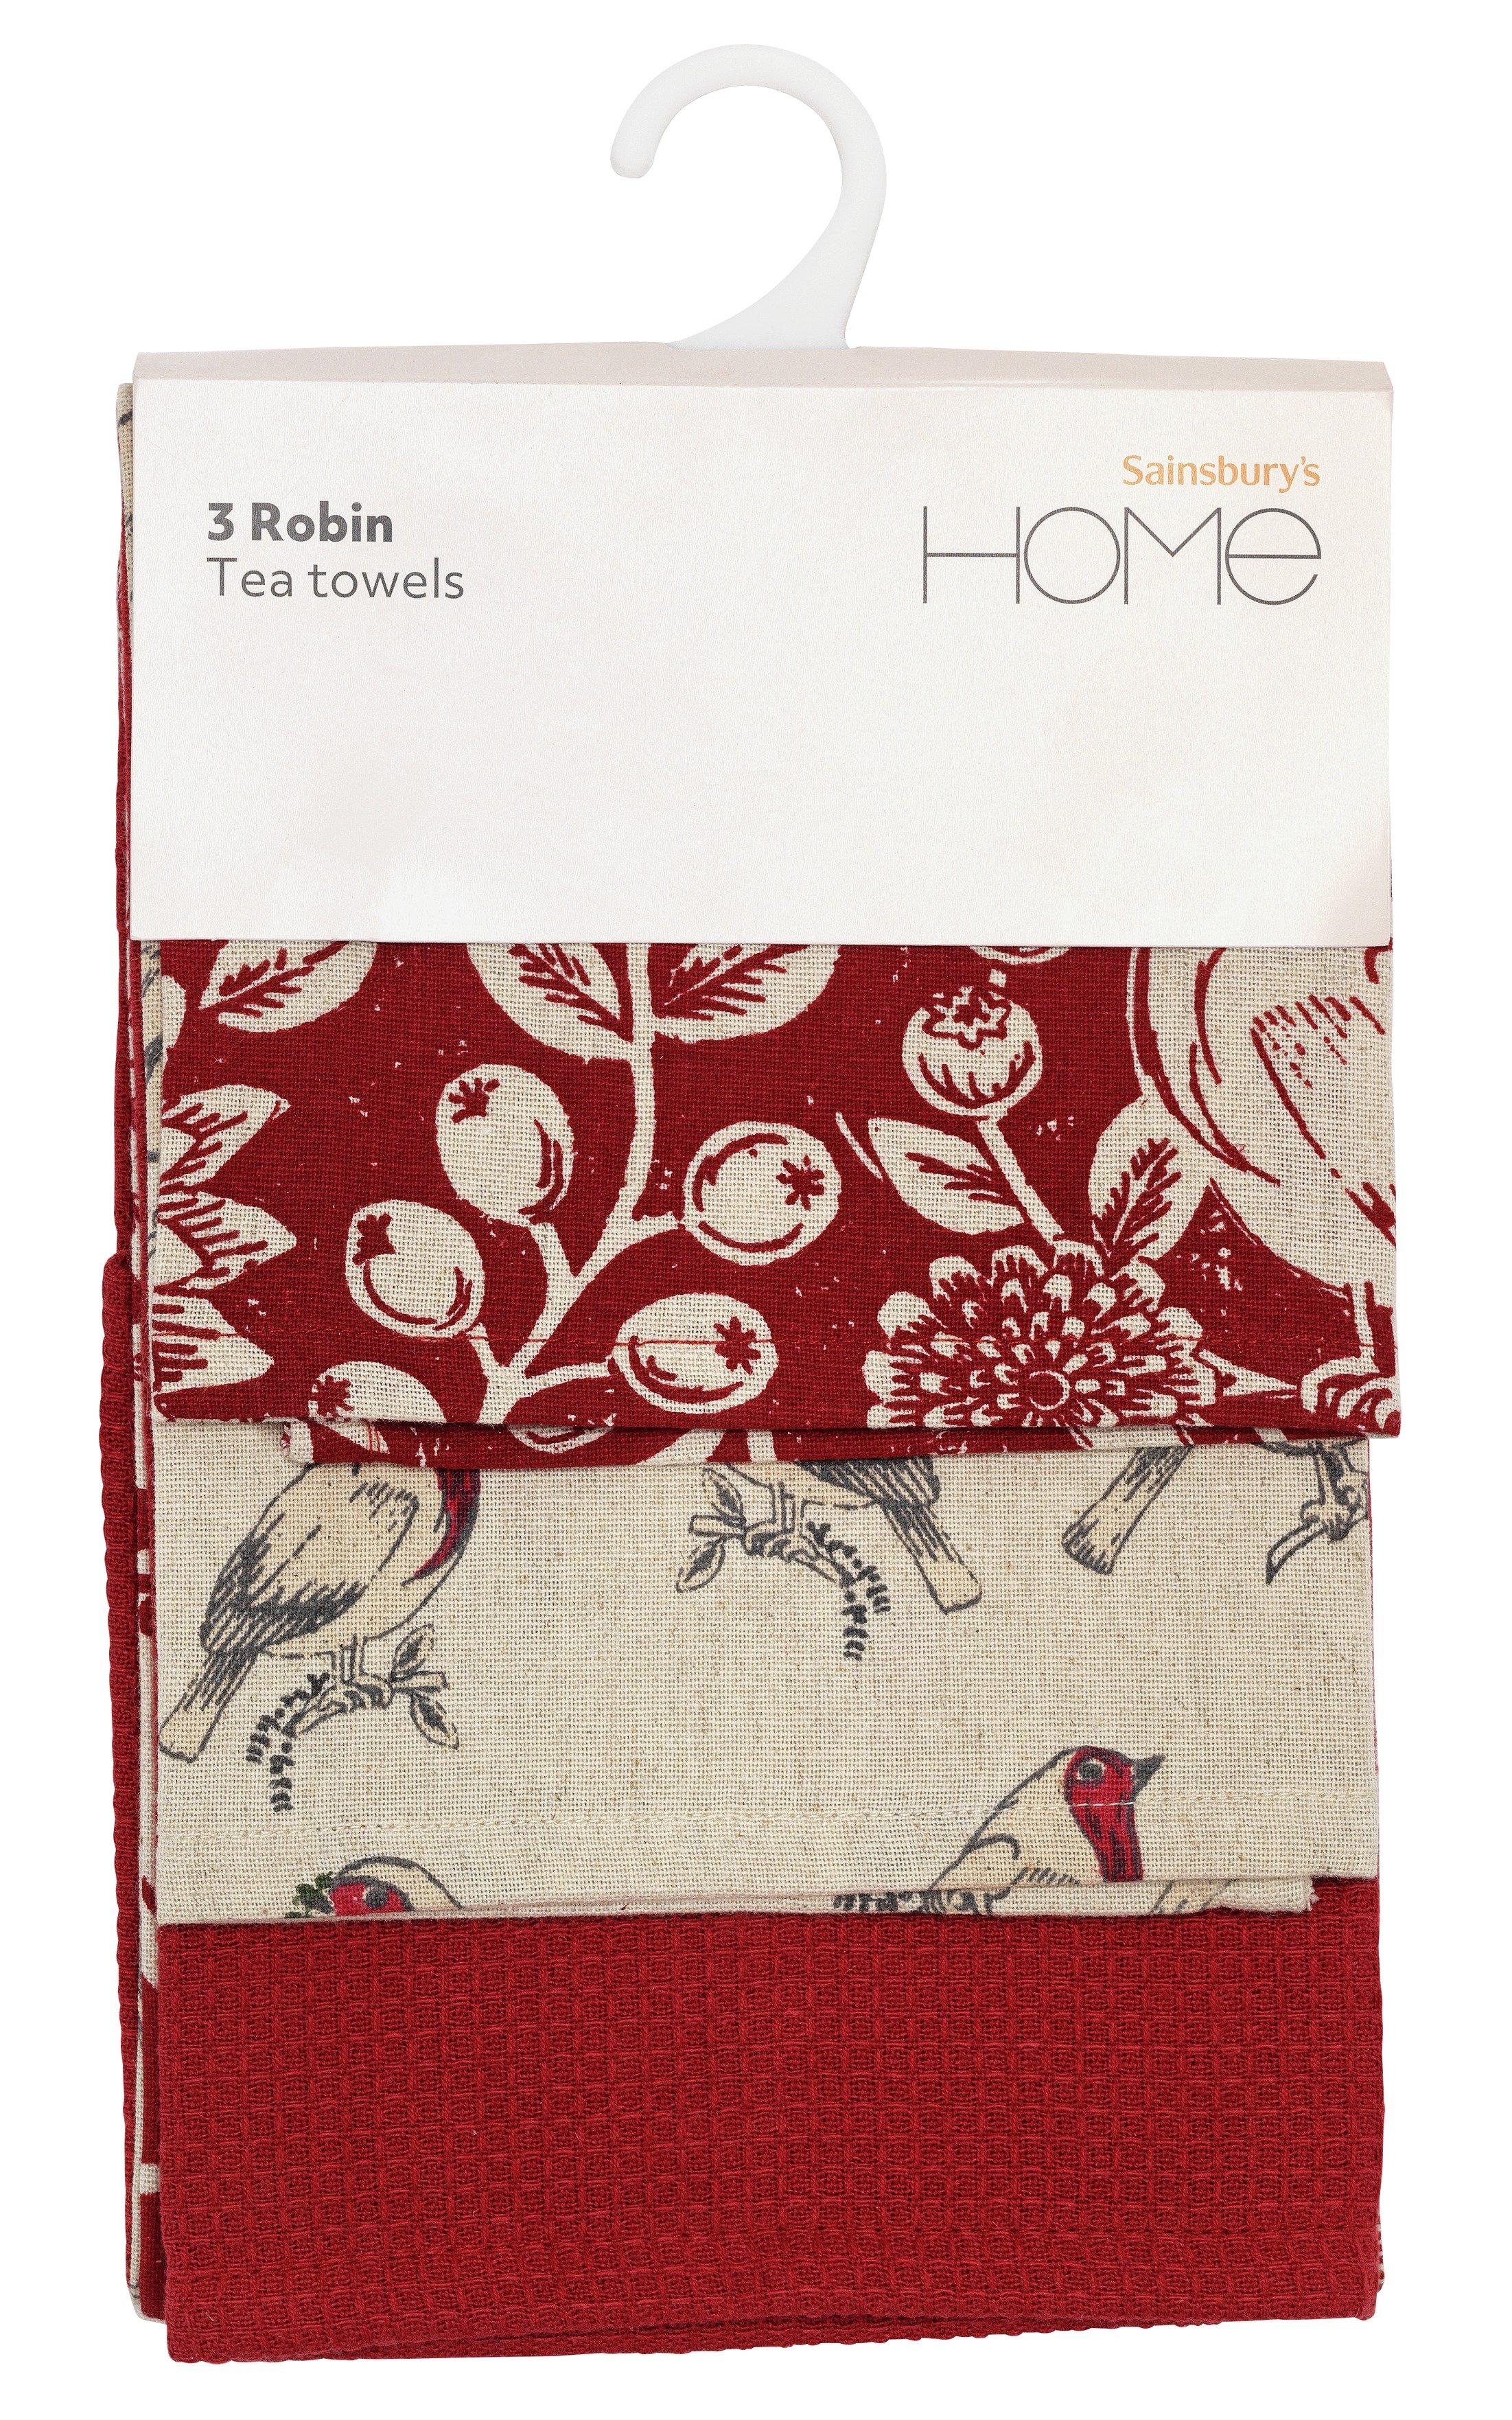 Sainsbury's Home Pack of 3 Robin Tea Towels